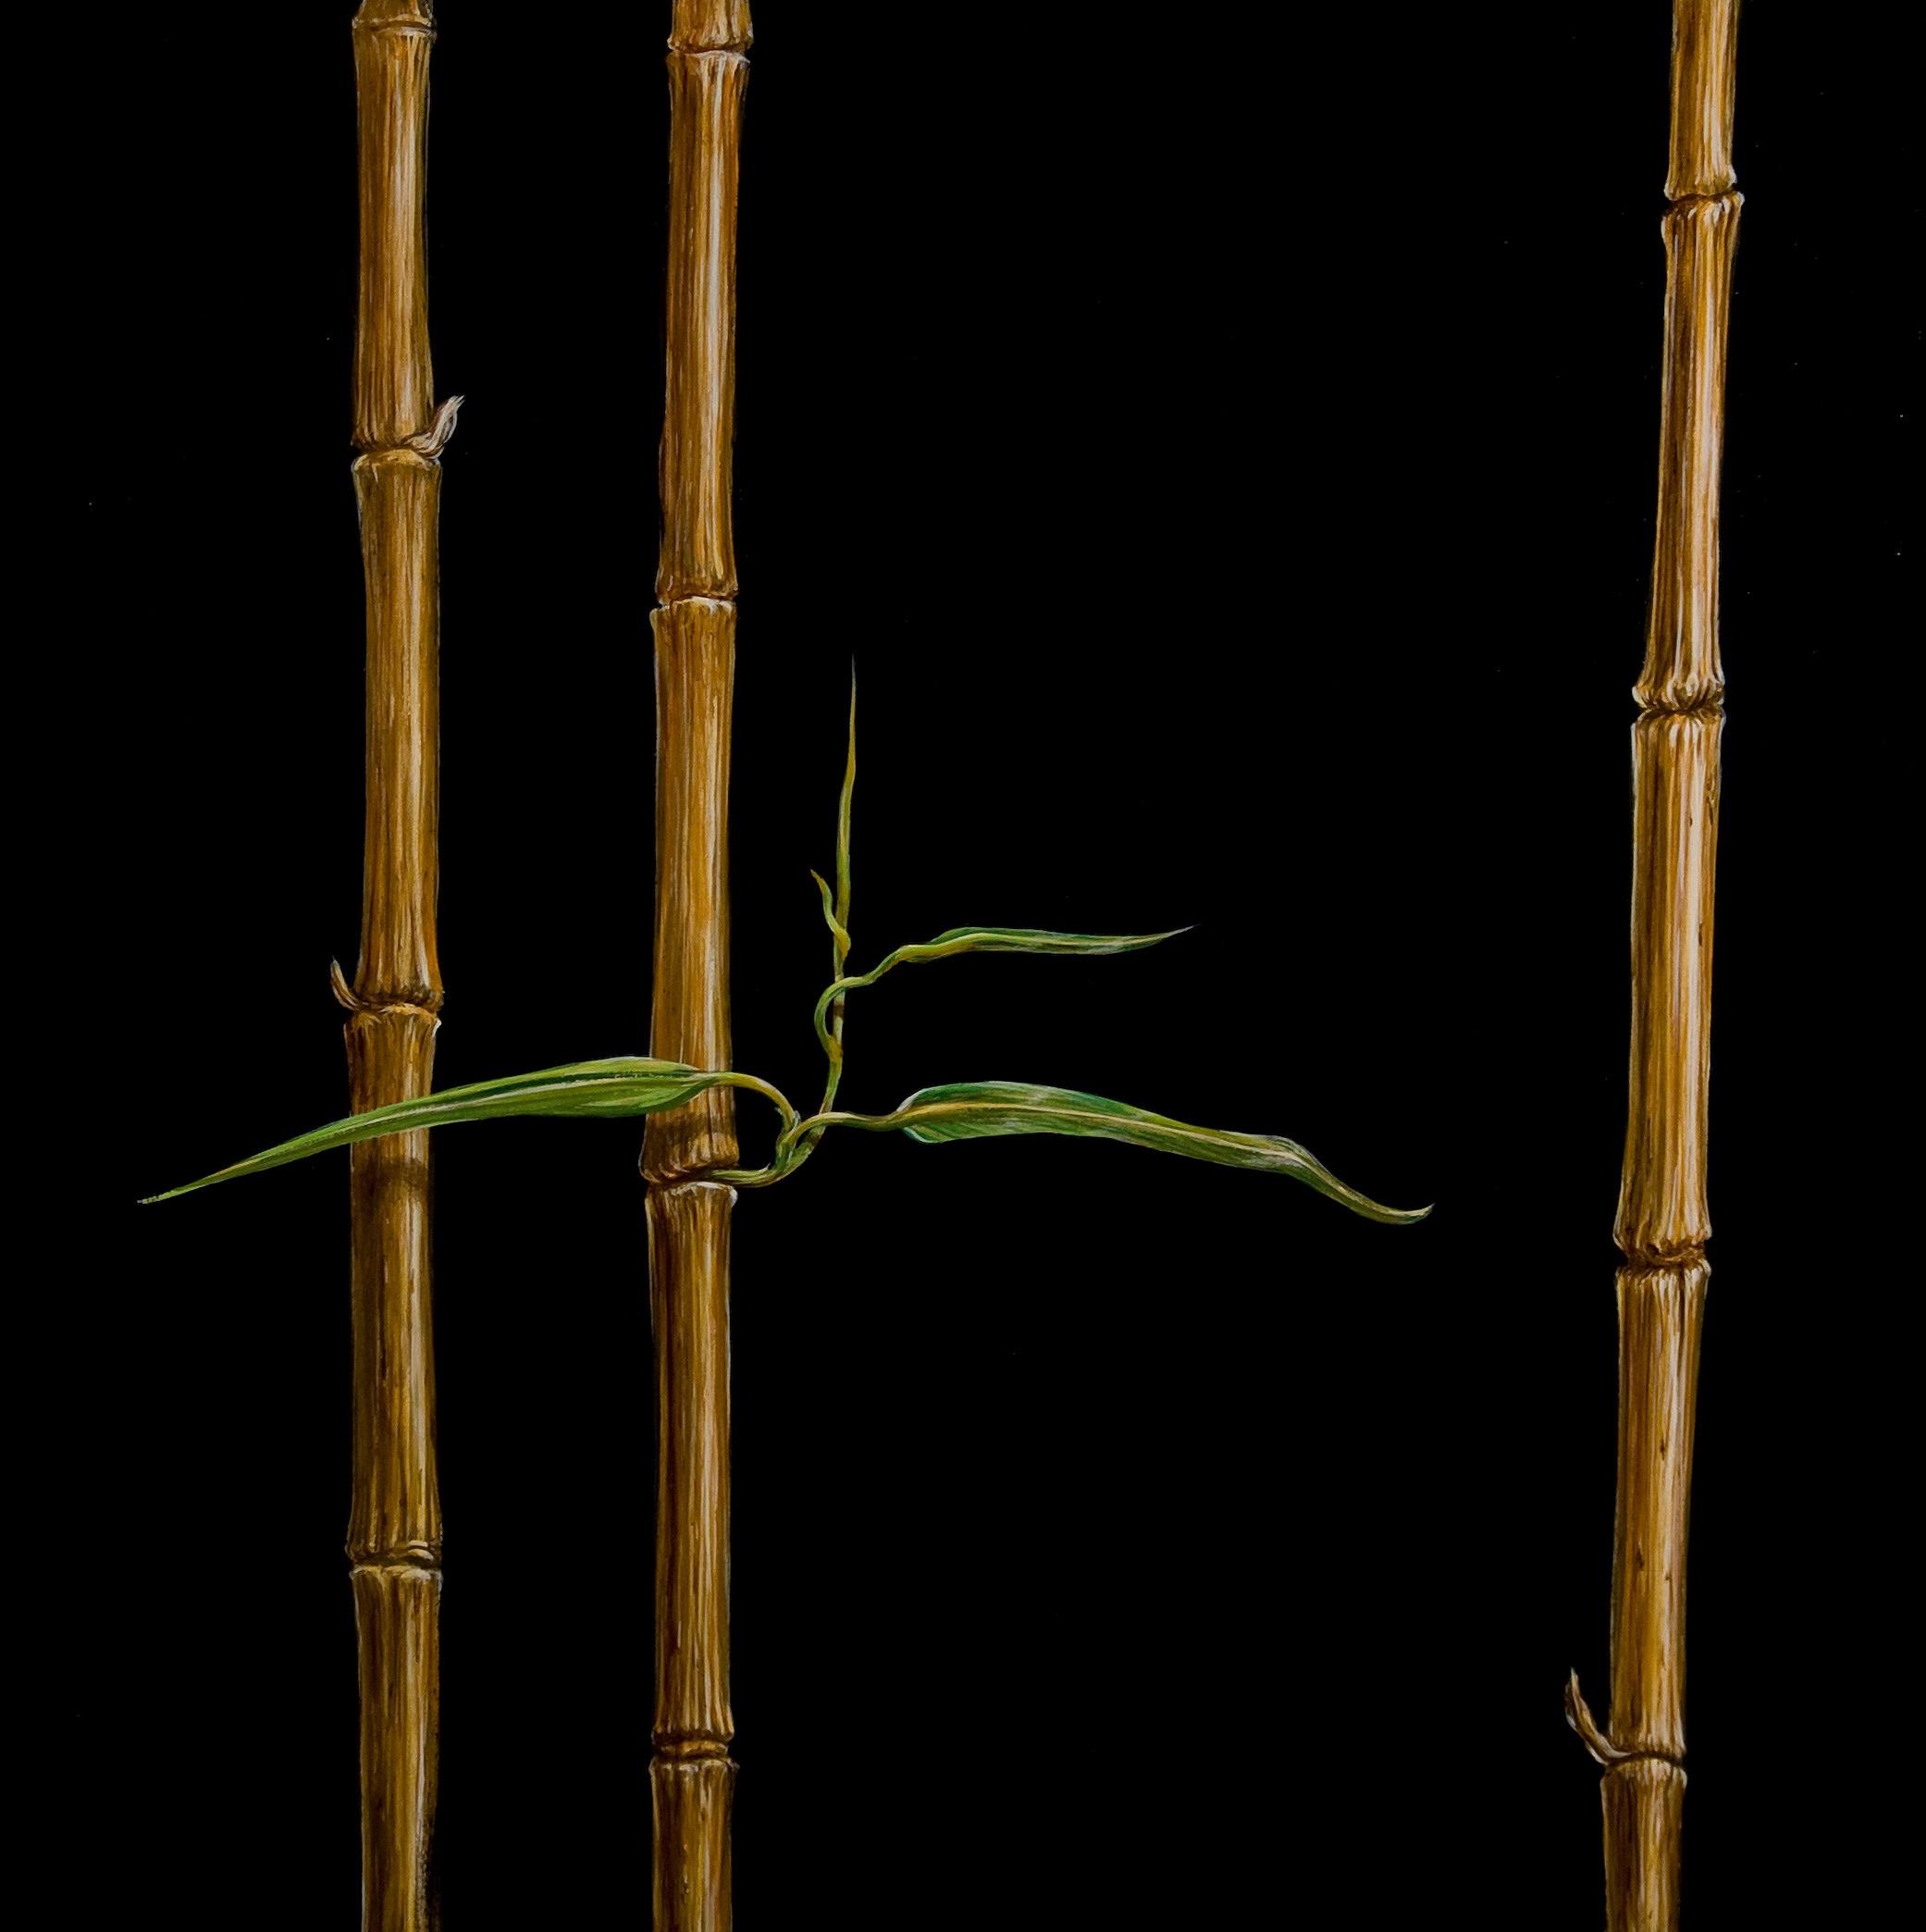 Bamboo black oil on panel 24 x 24